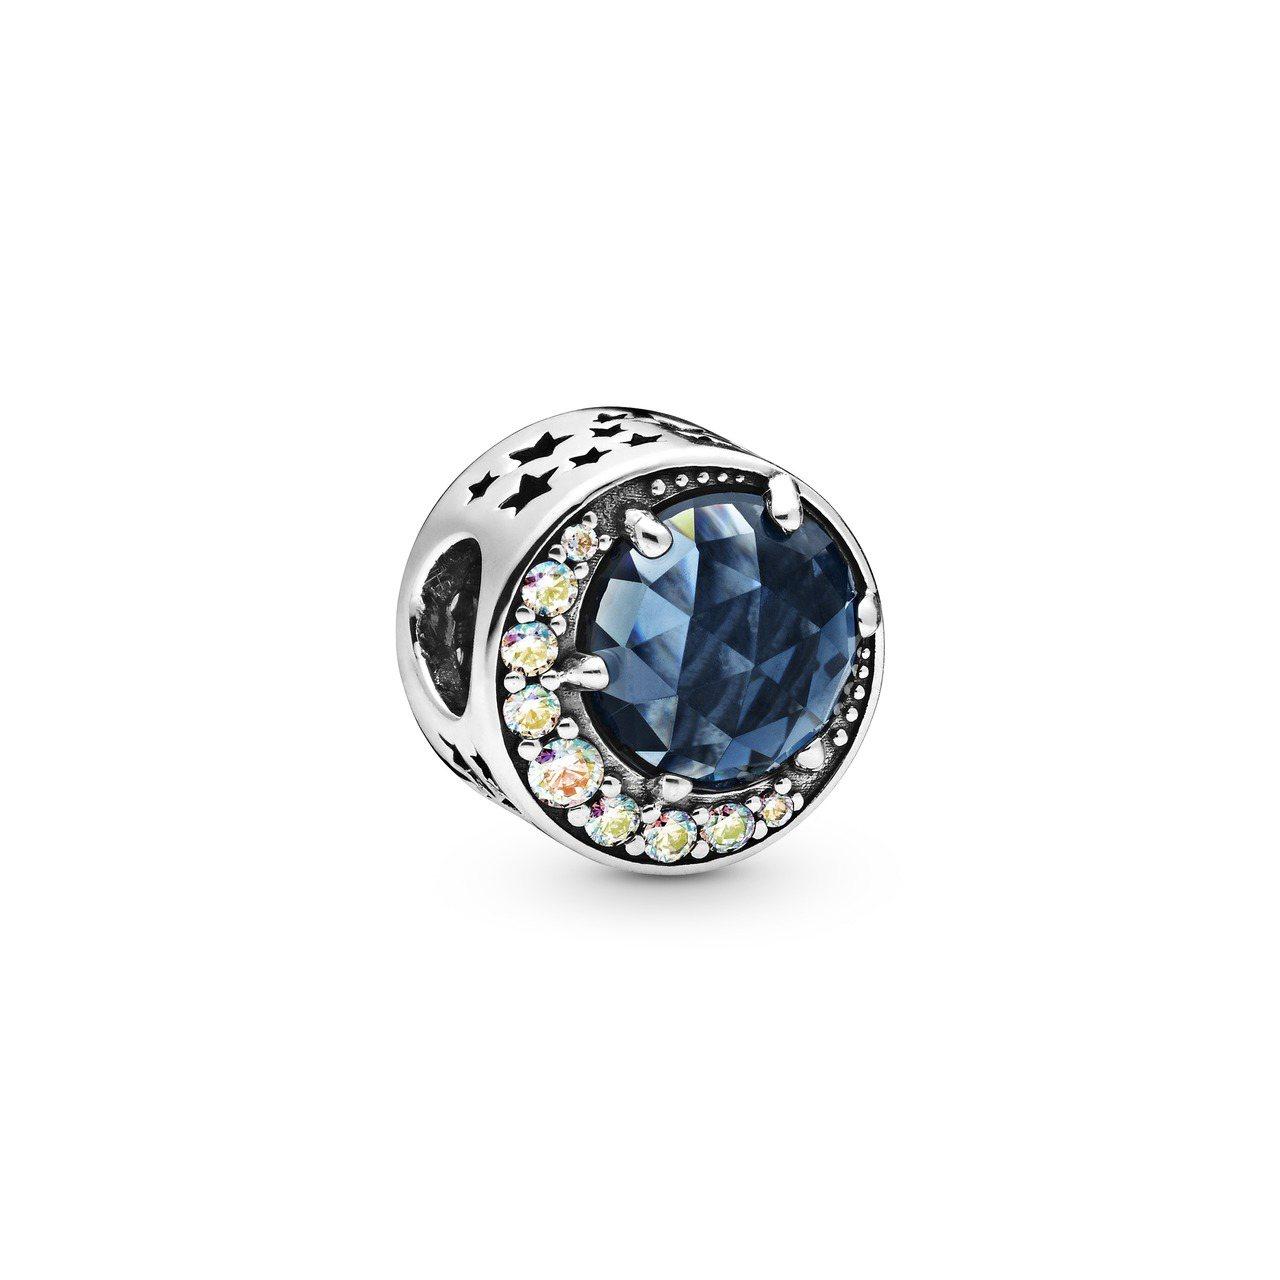 Pandora星月皎潔多彩極光串飾3,280元。圖/Pandora提供